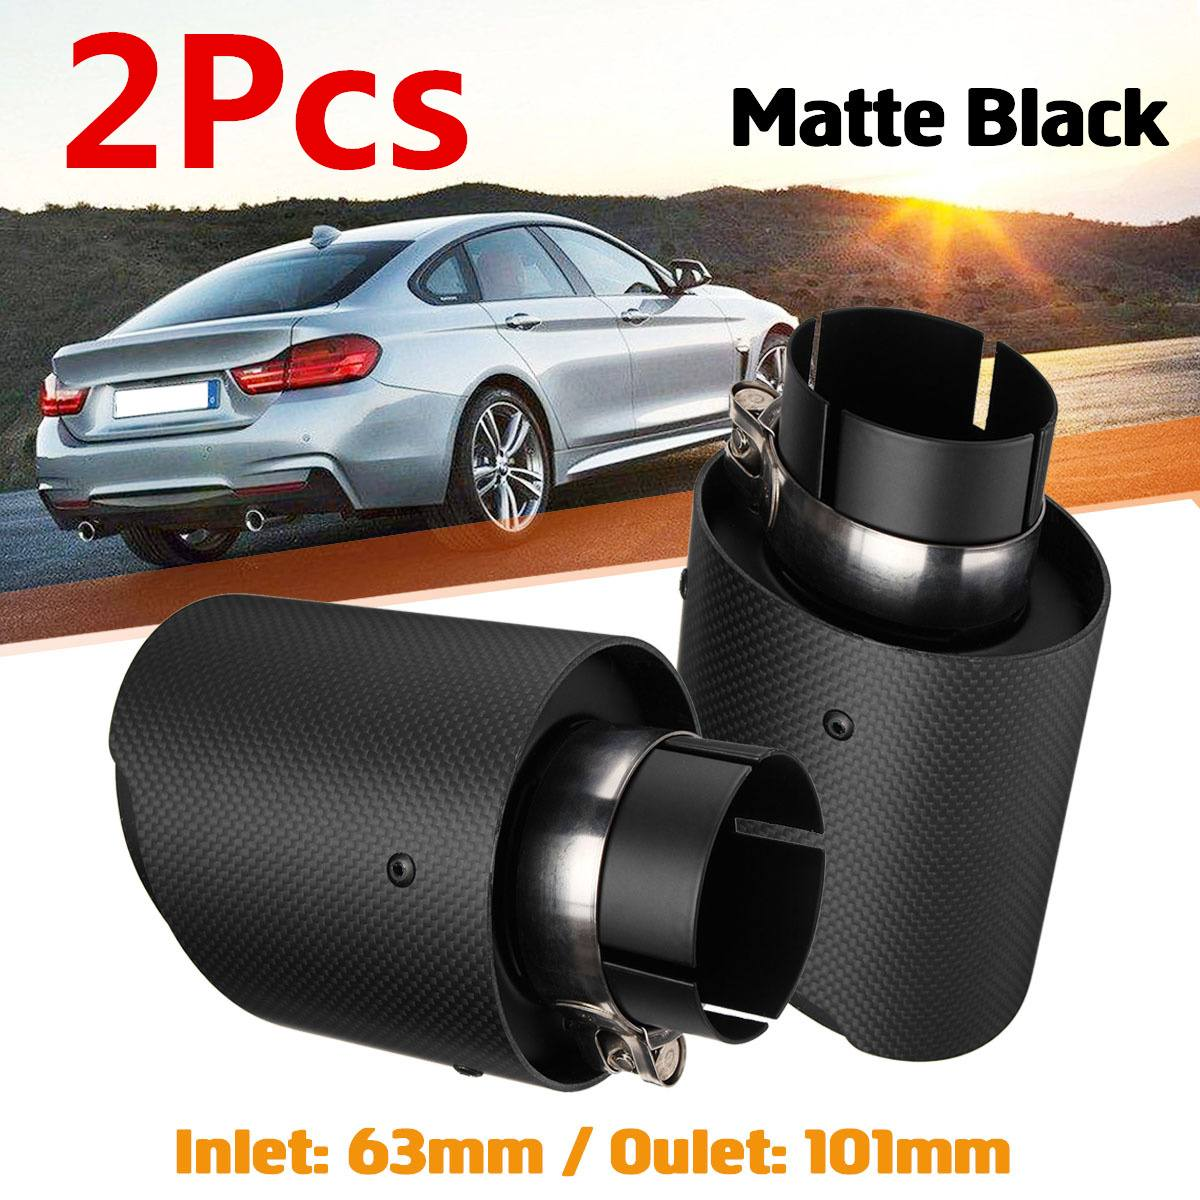 2Pcs Universal 63 101mm Car Carbon Fiber Exhaust Rear Muffler Tip Pipe Car Rear Tail Throat